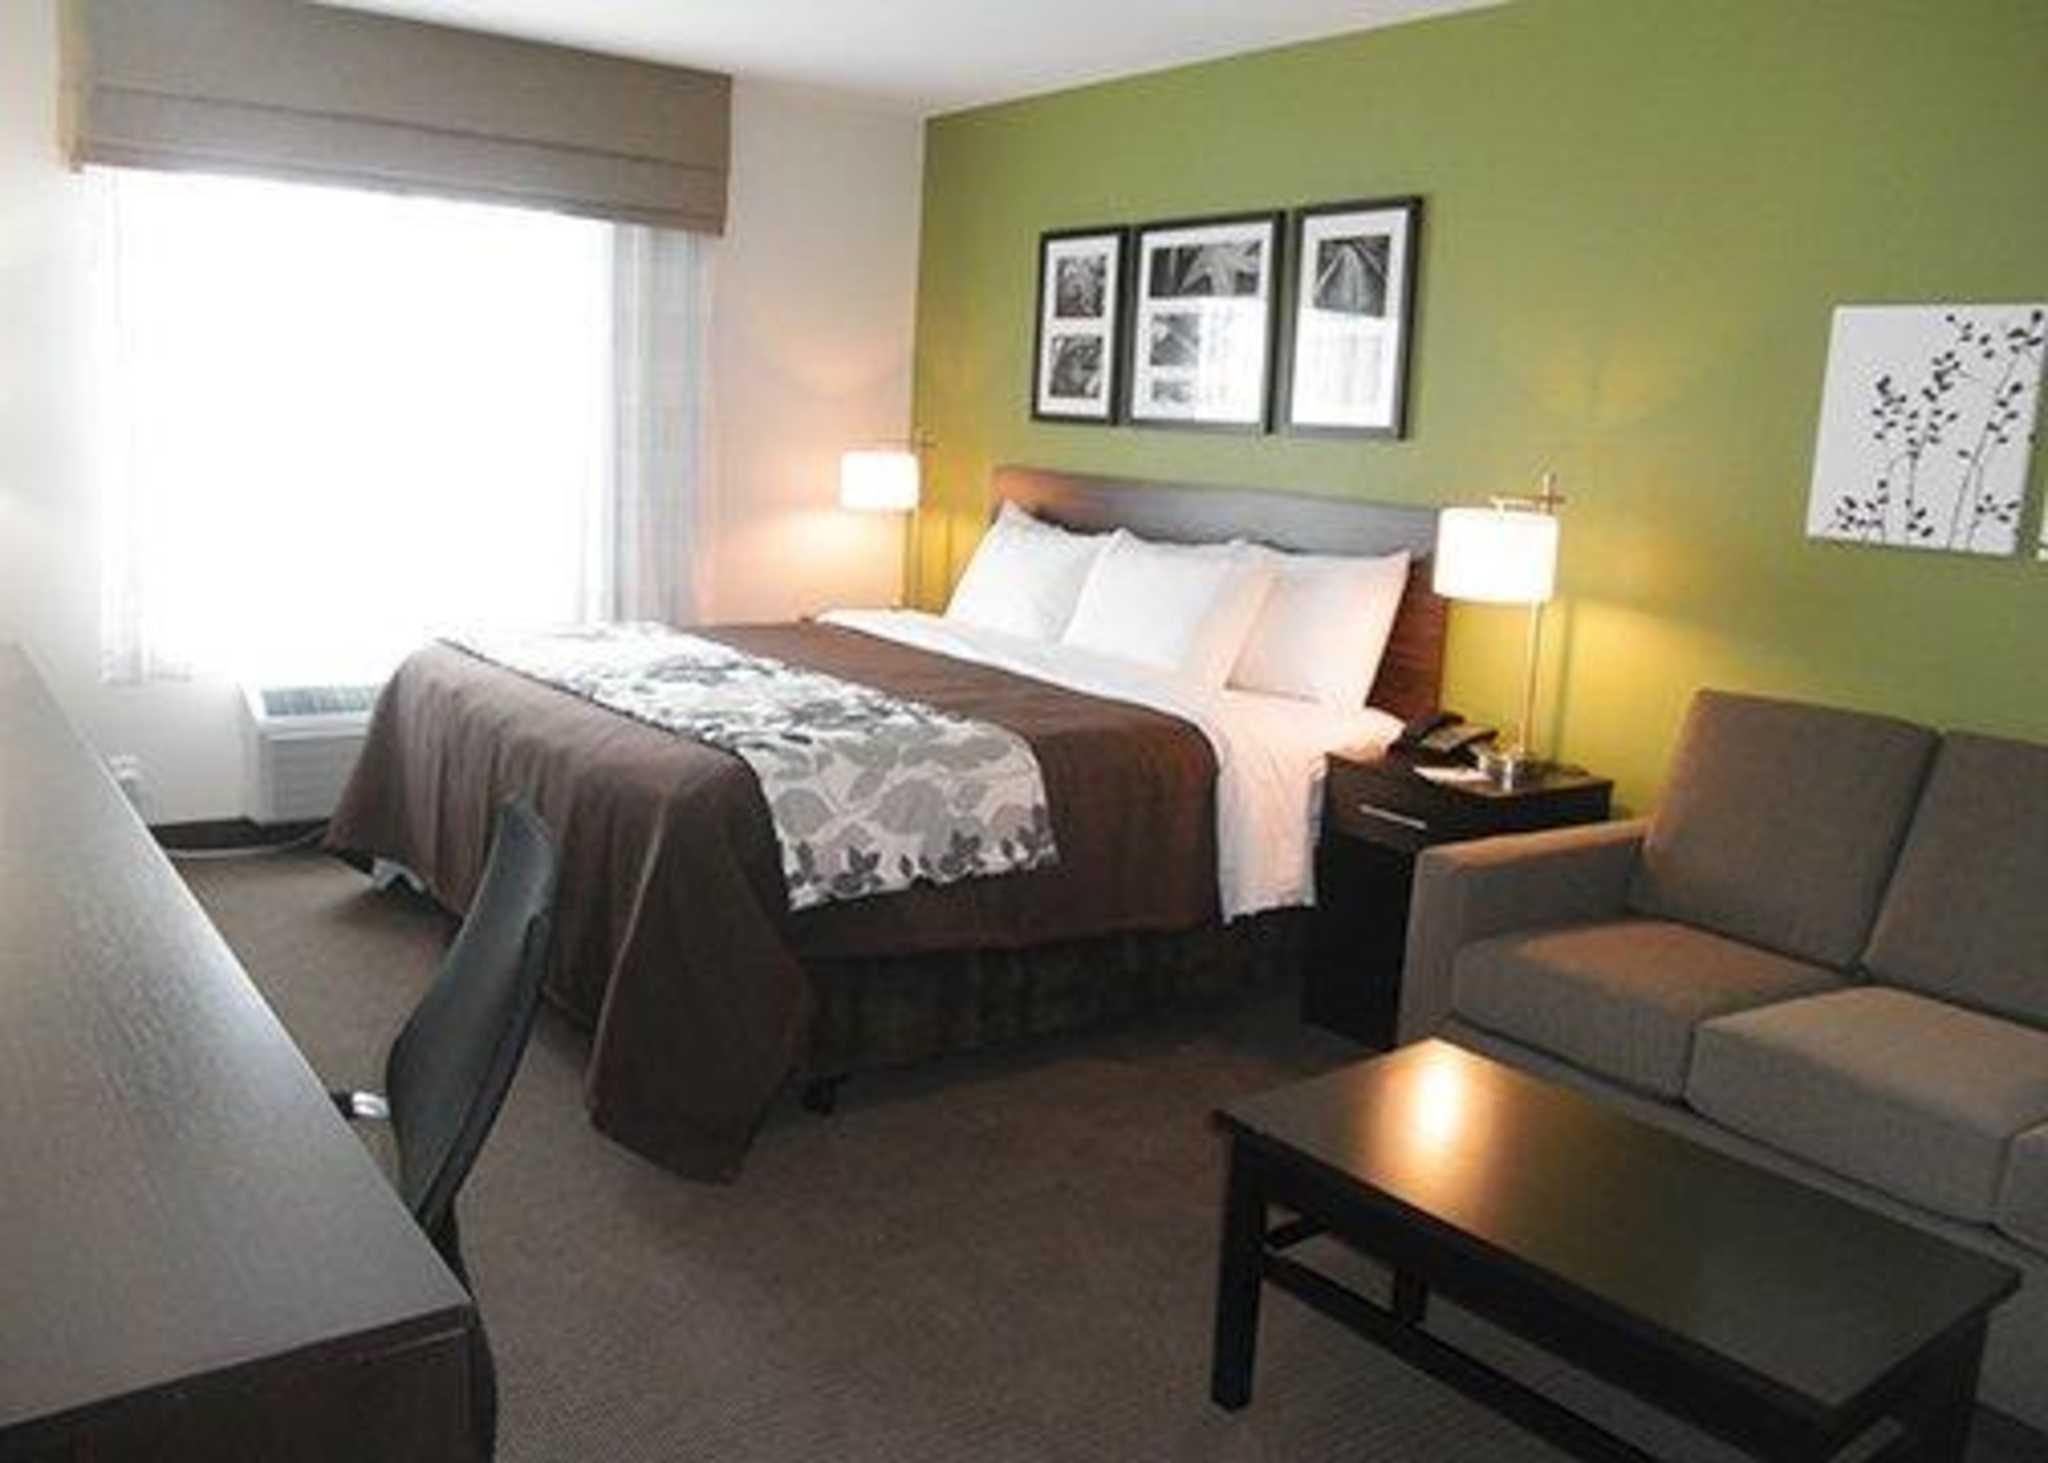 Sleep Inn & Suites Belmont / St. Clairsville image 6